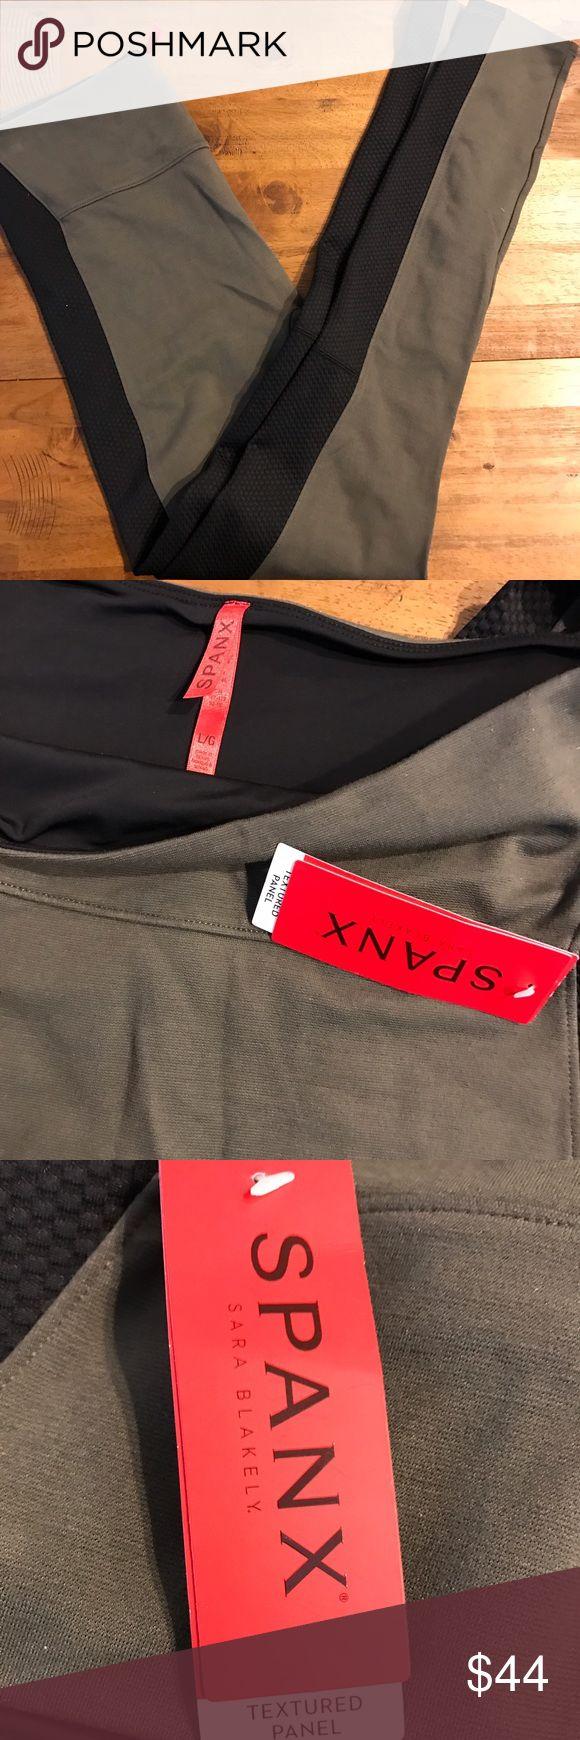 Textured Paneled Spanx Olive and black textured paneled spanx SPANX Pants Leggings